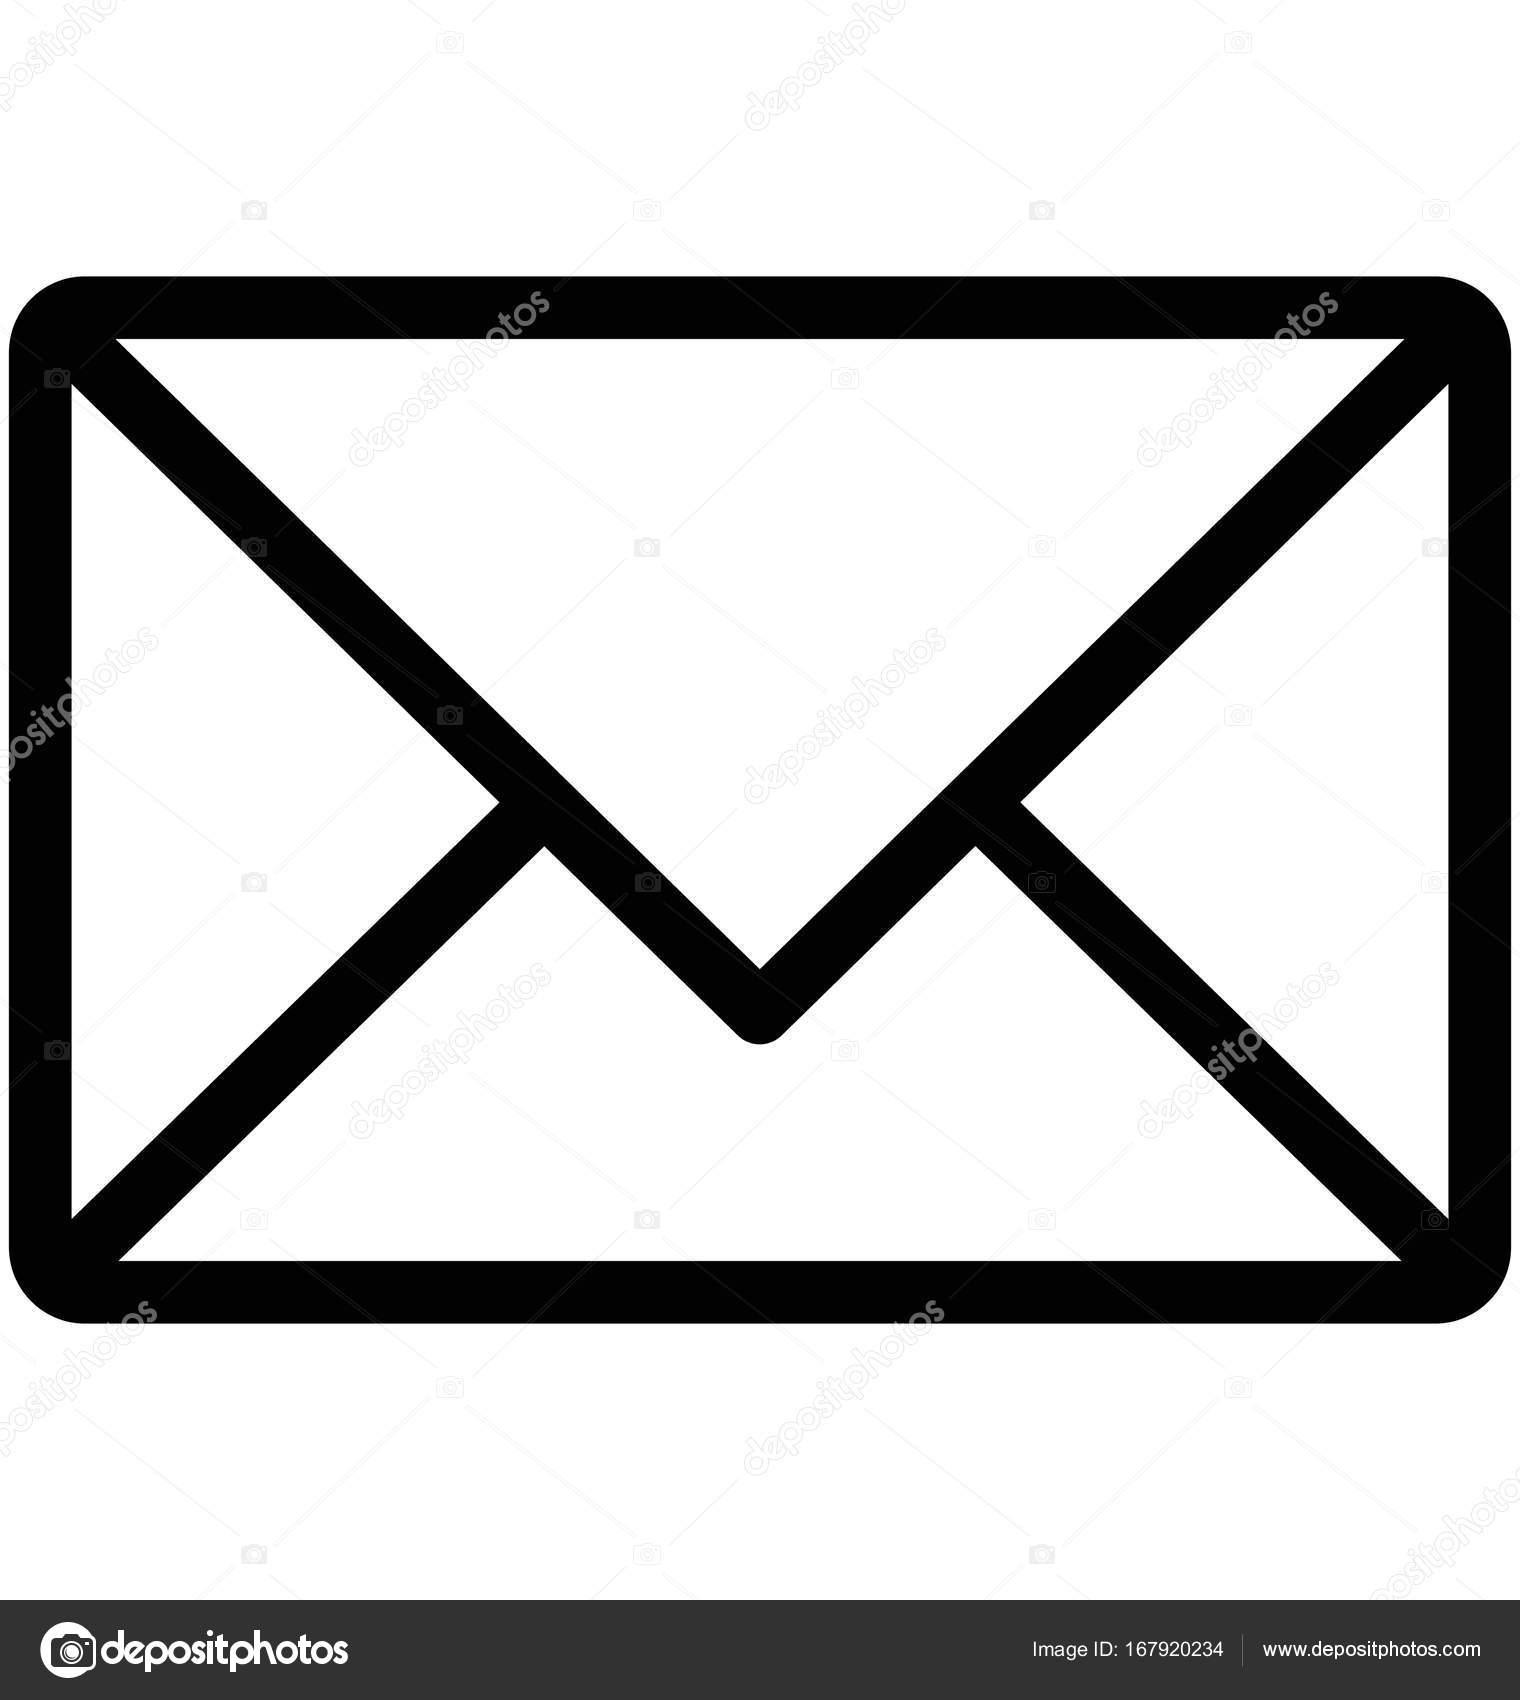 envelope vector icon stock vector vectorsmarket 167920234 rh depositphotos com enveloppe vectorielle envelope vector free download